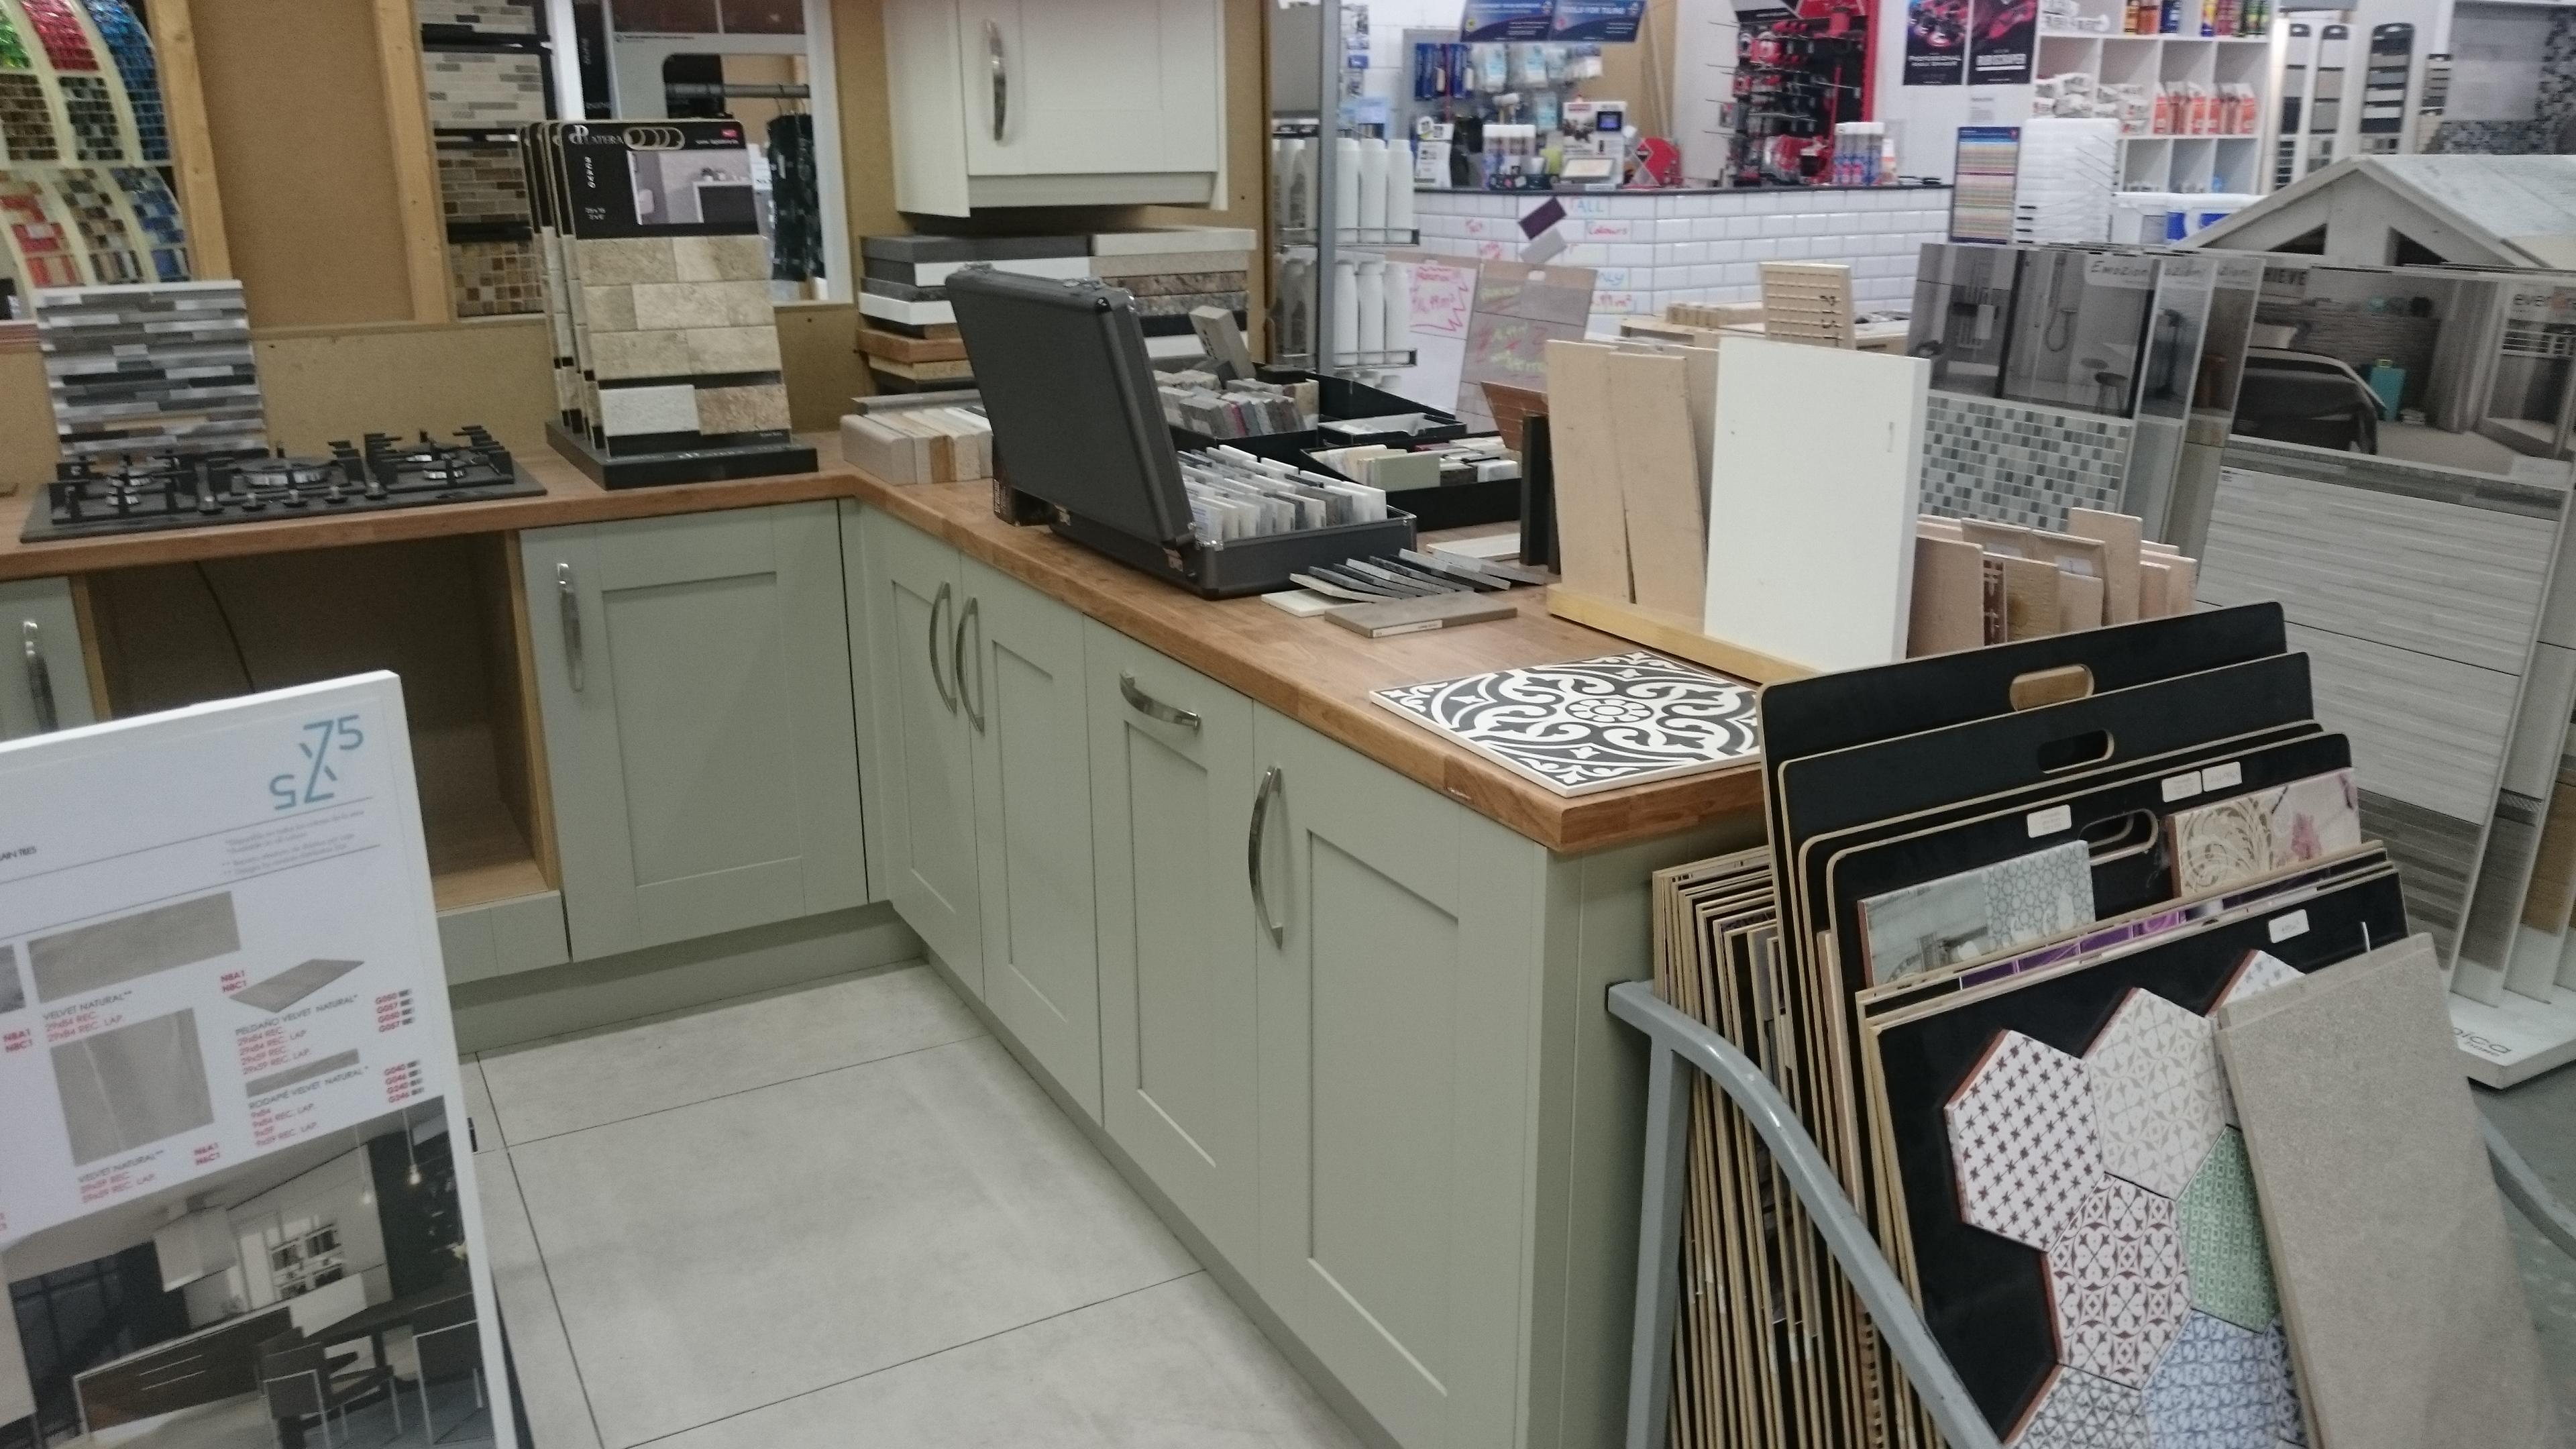 kitchen and appliances for sale on bbx bbx uk